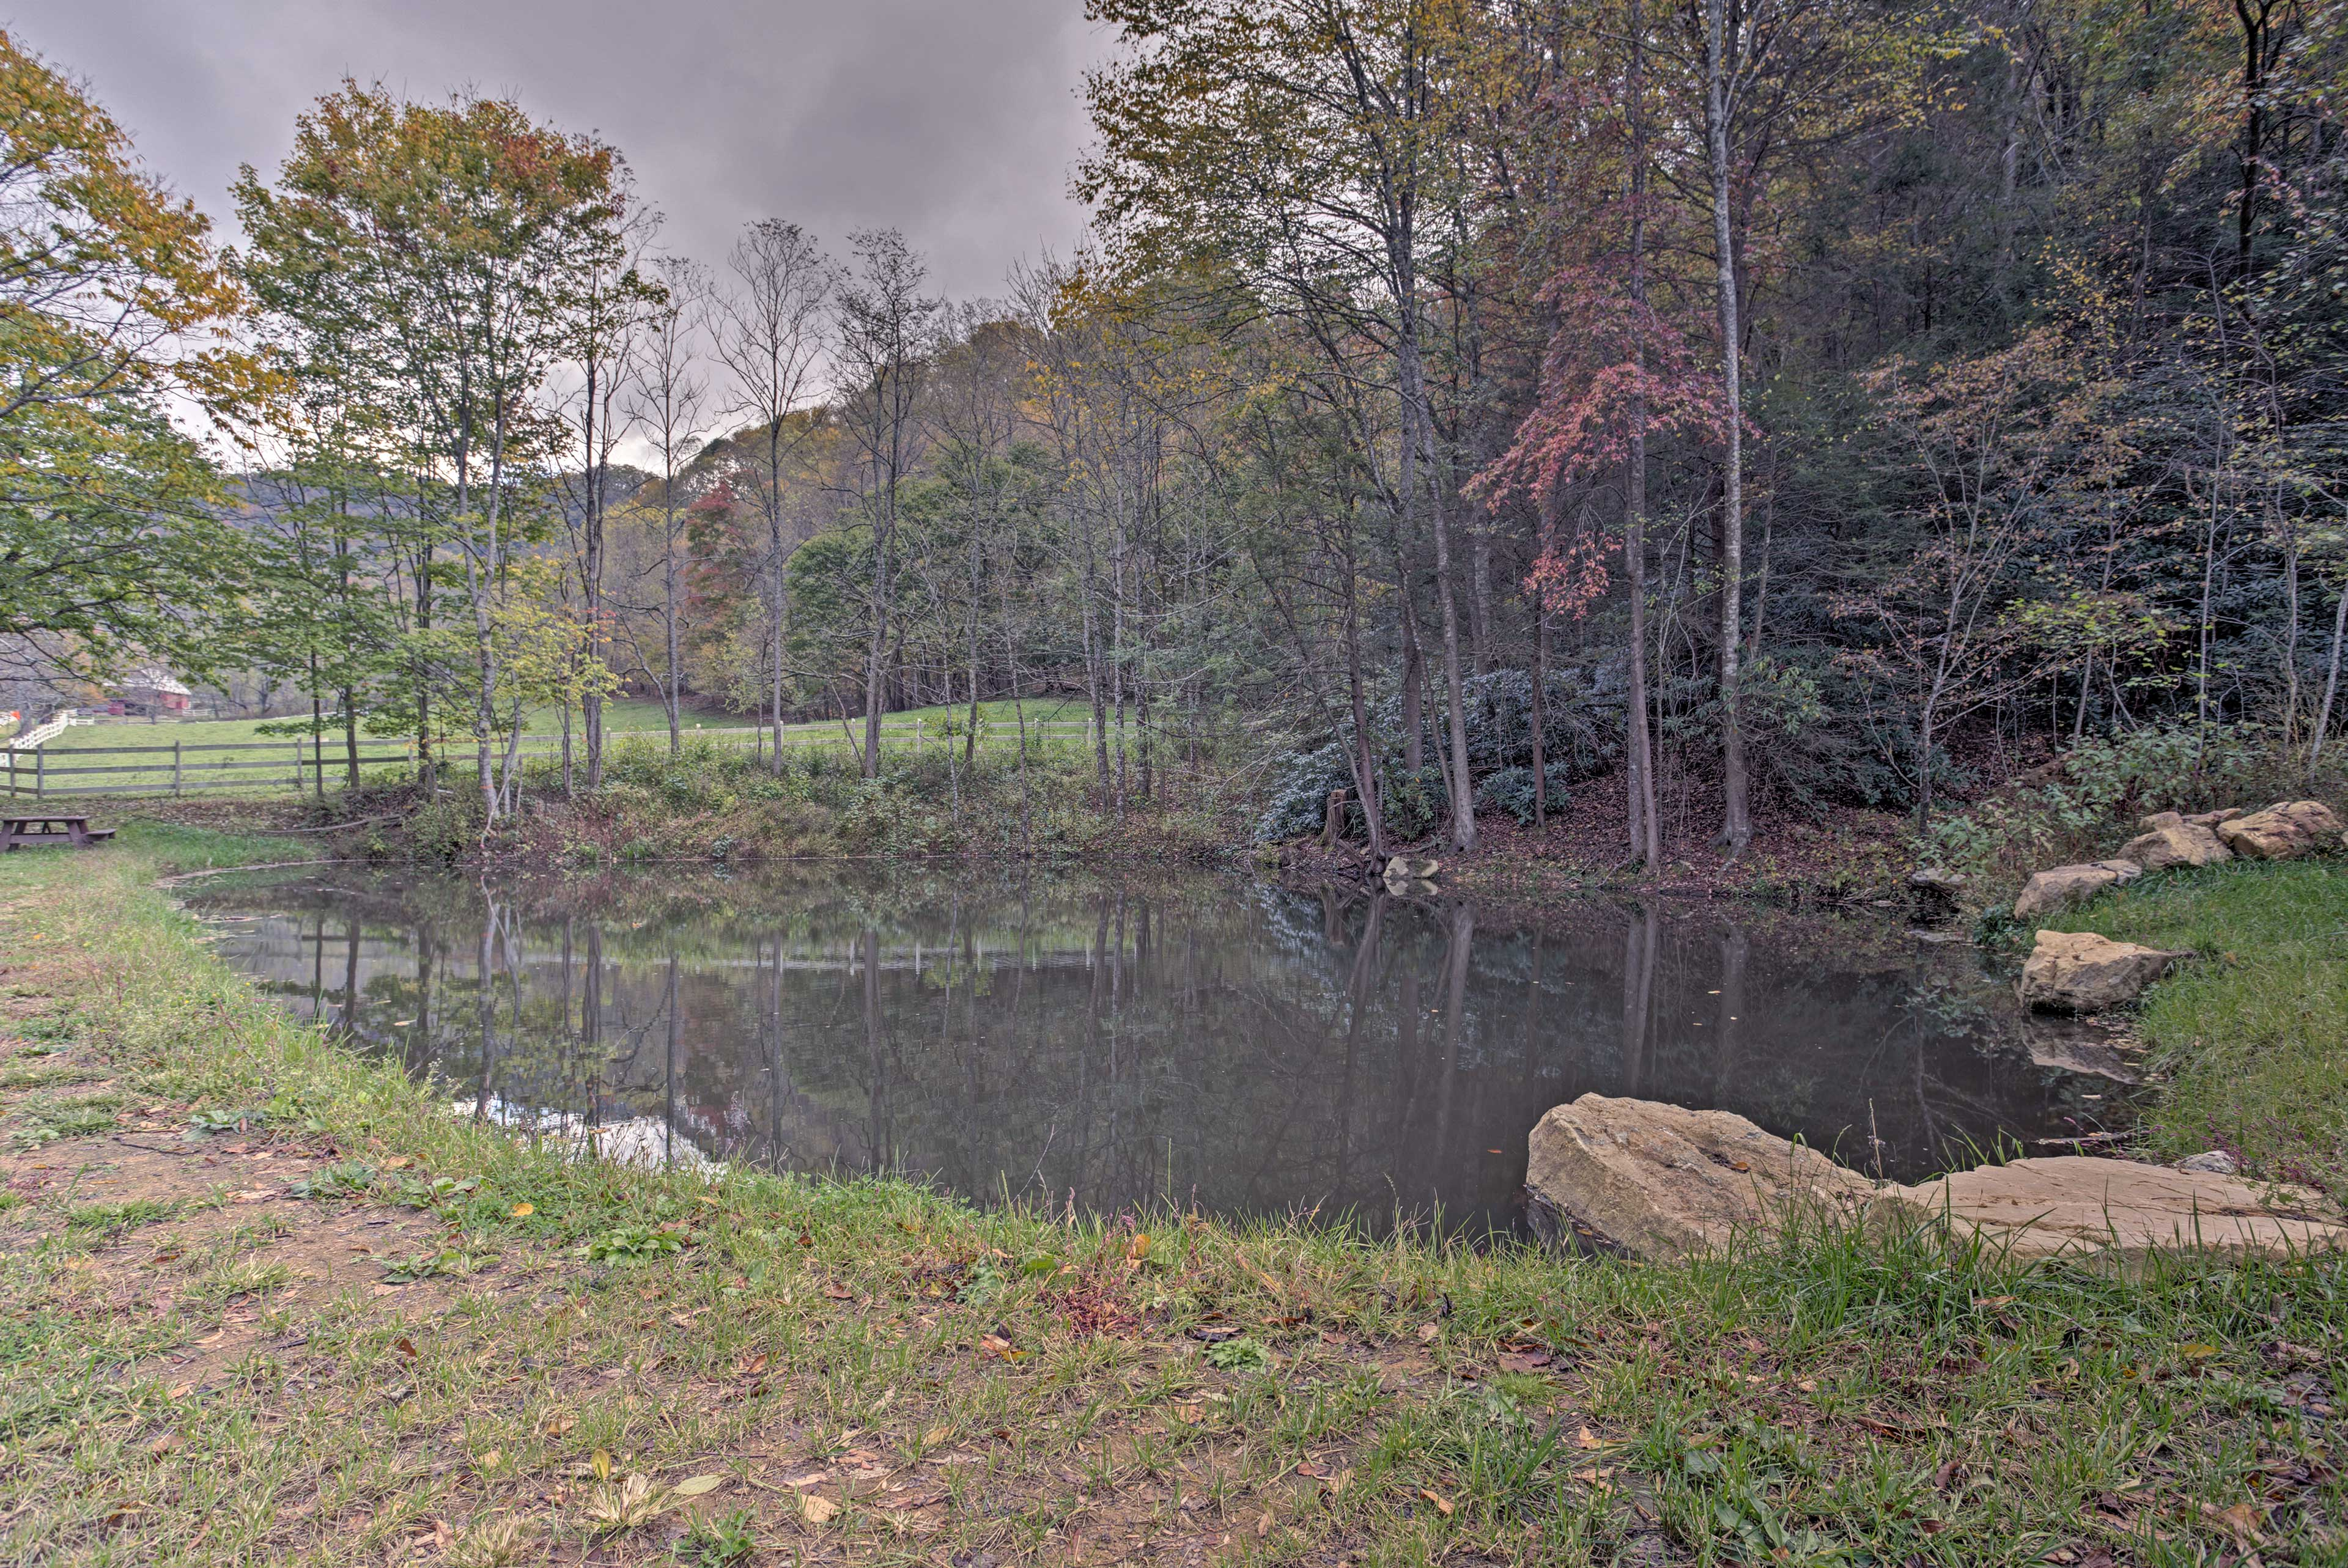 Skip rocks along the calm pond.